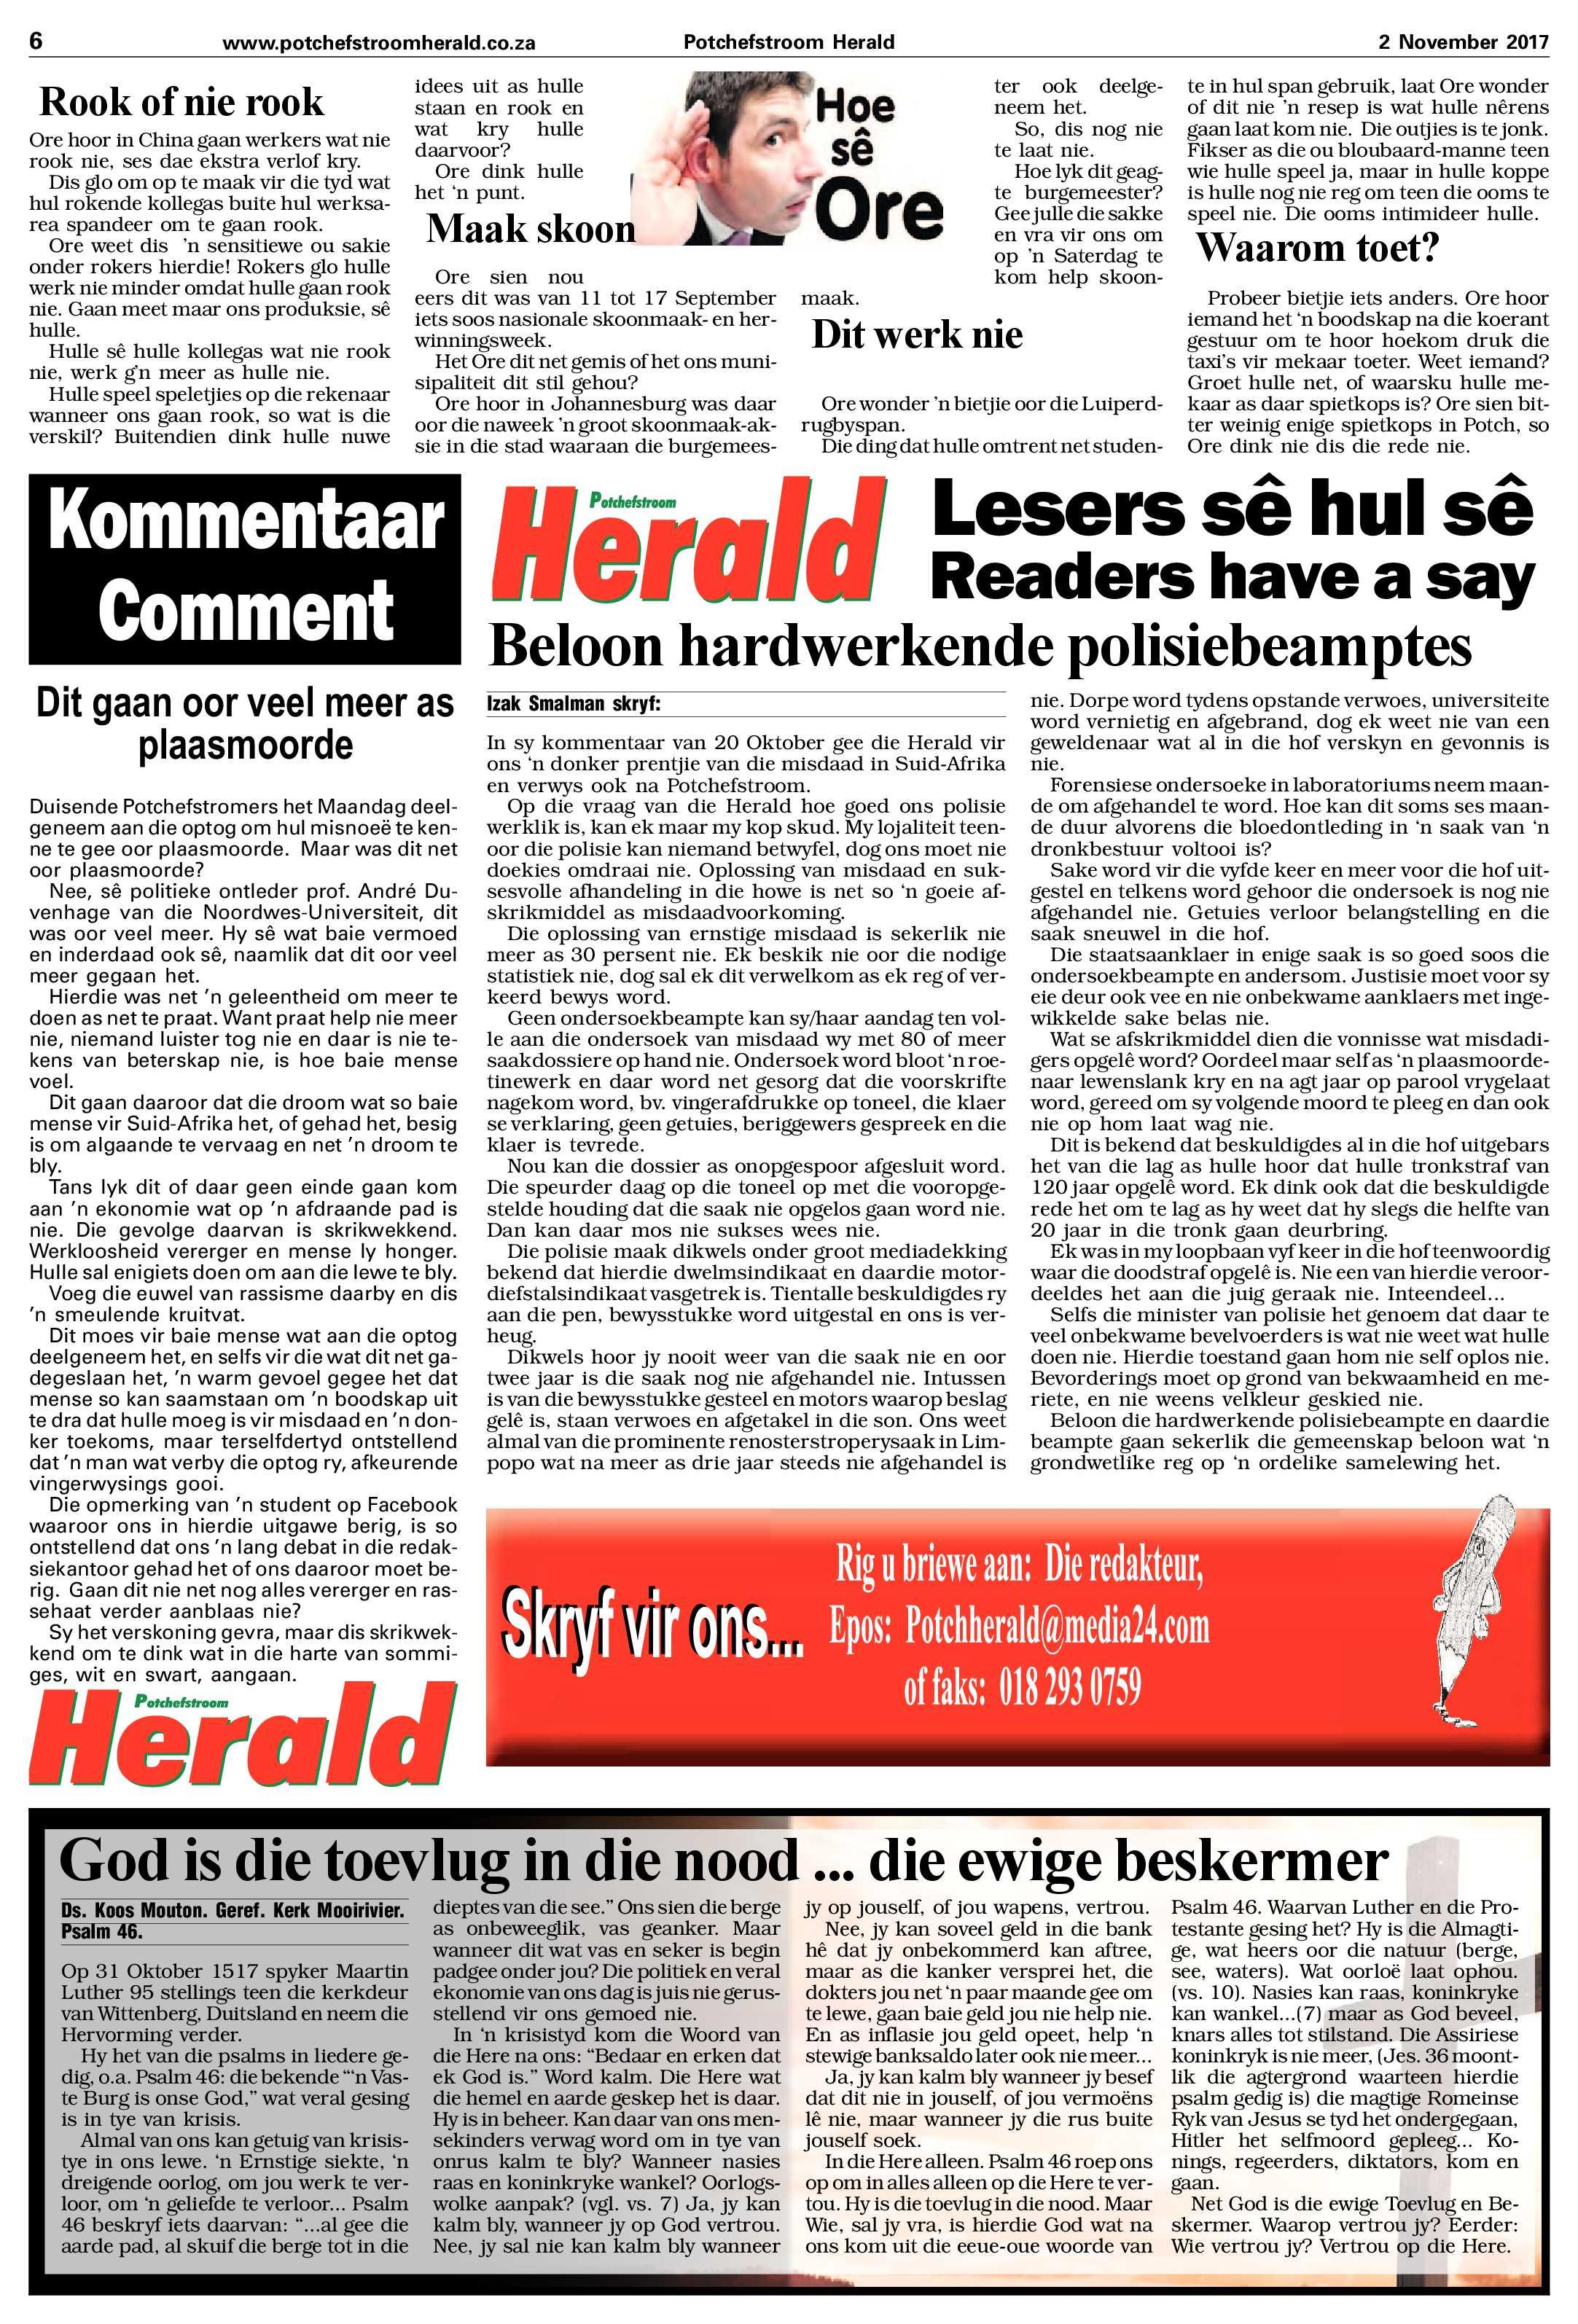 2-november-2017-epapers-page-7